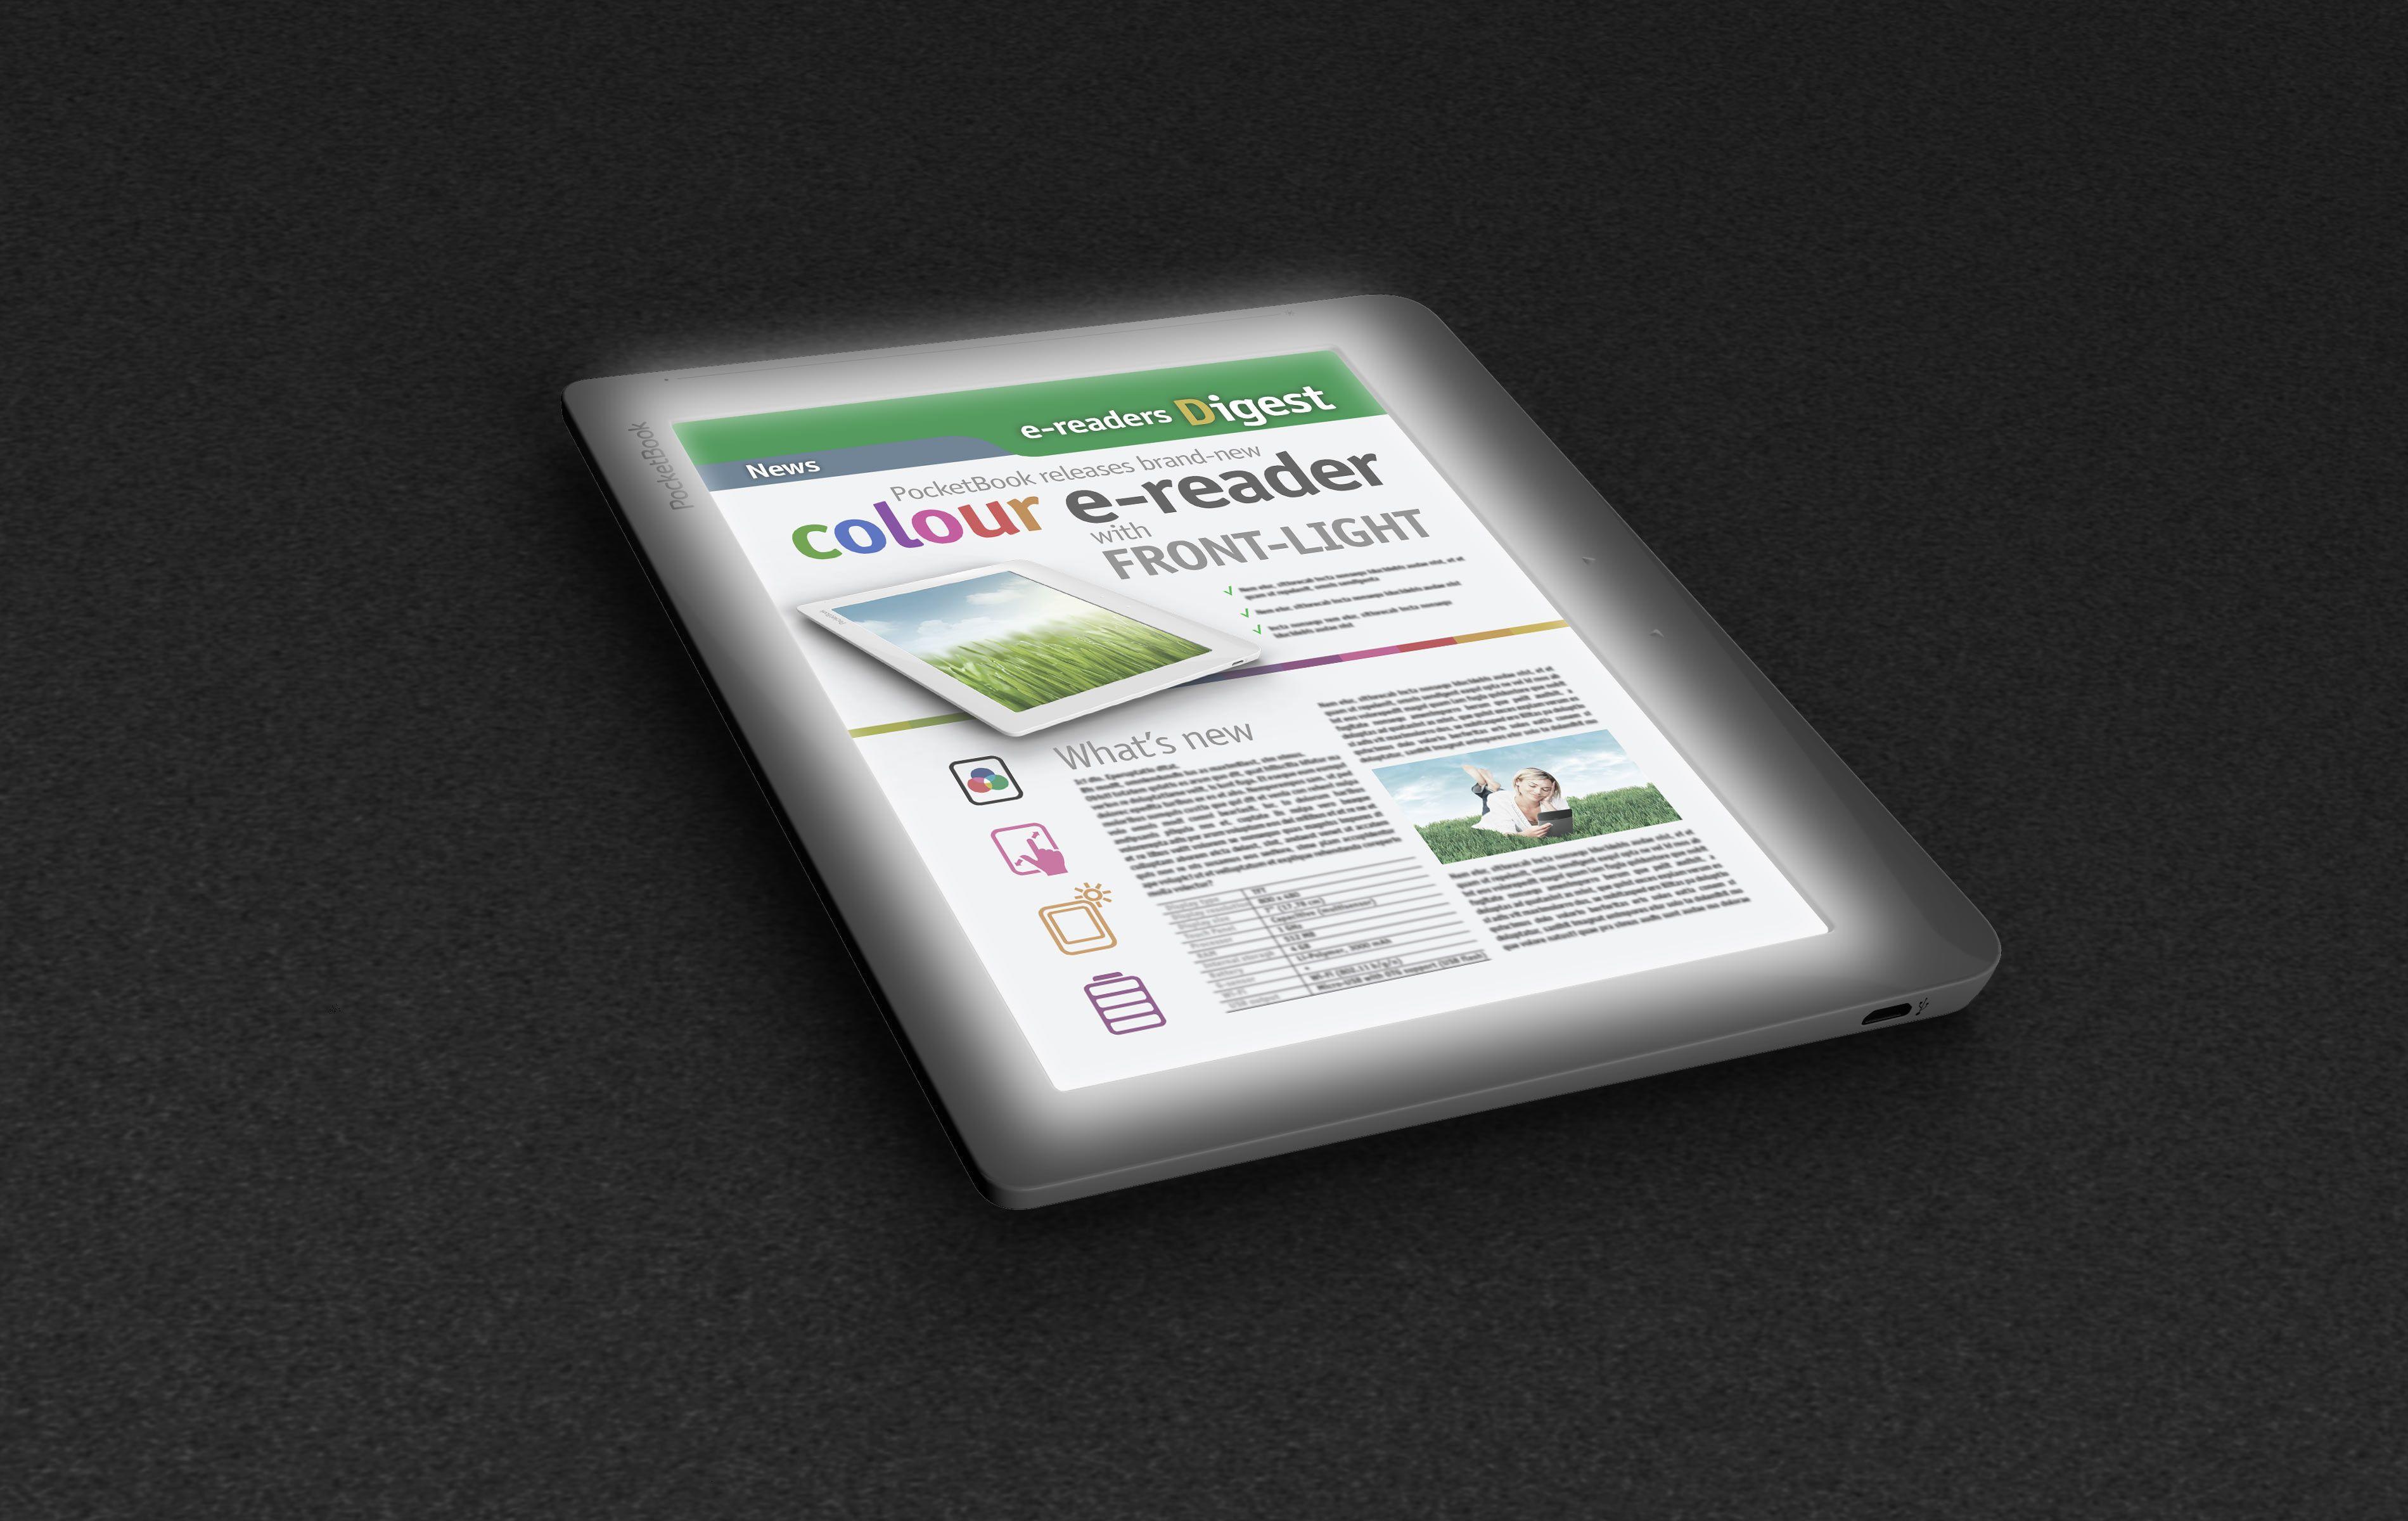 Pocketbook Announces Color E Reader With Front Light Pocket Book Readers Color